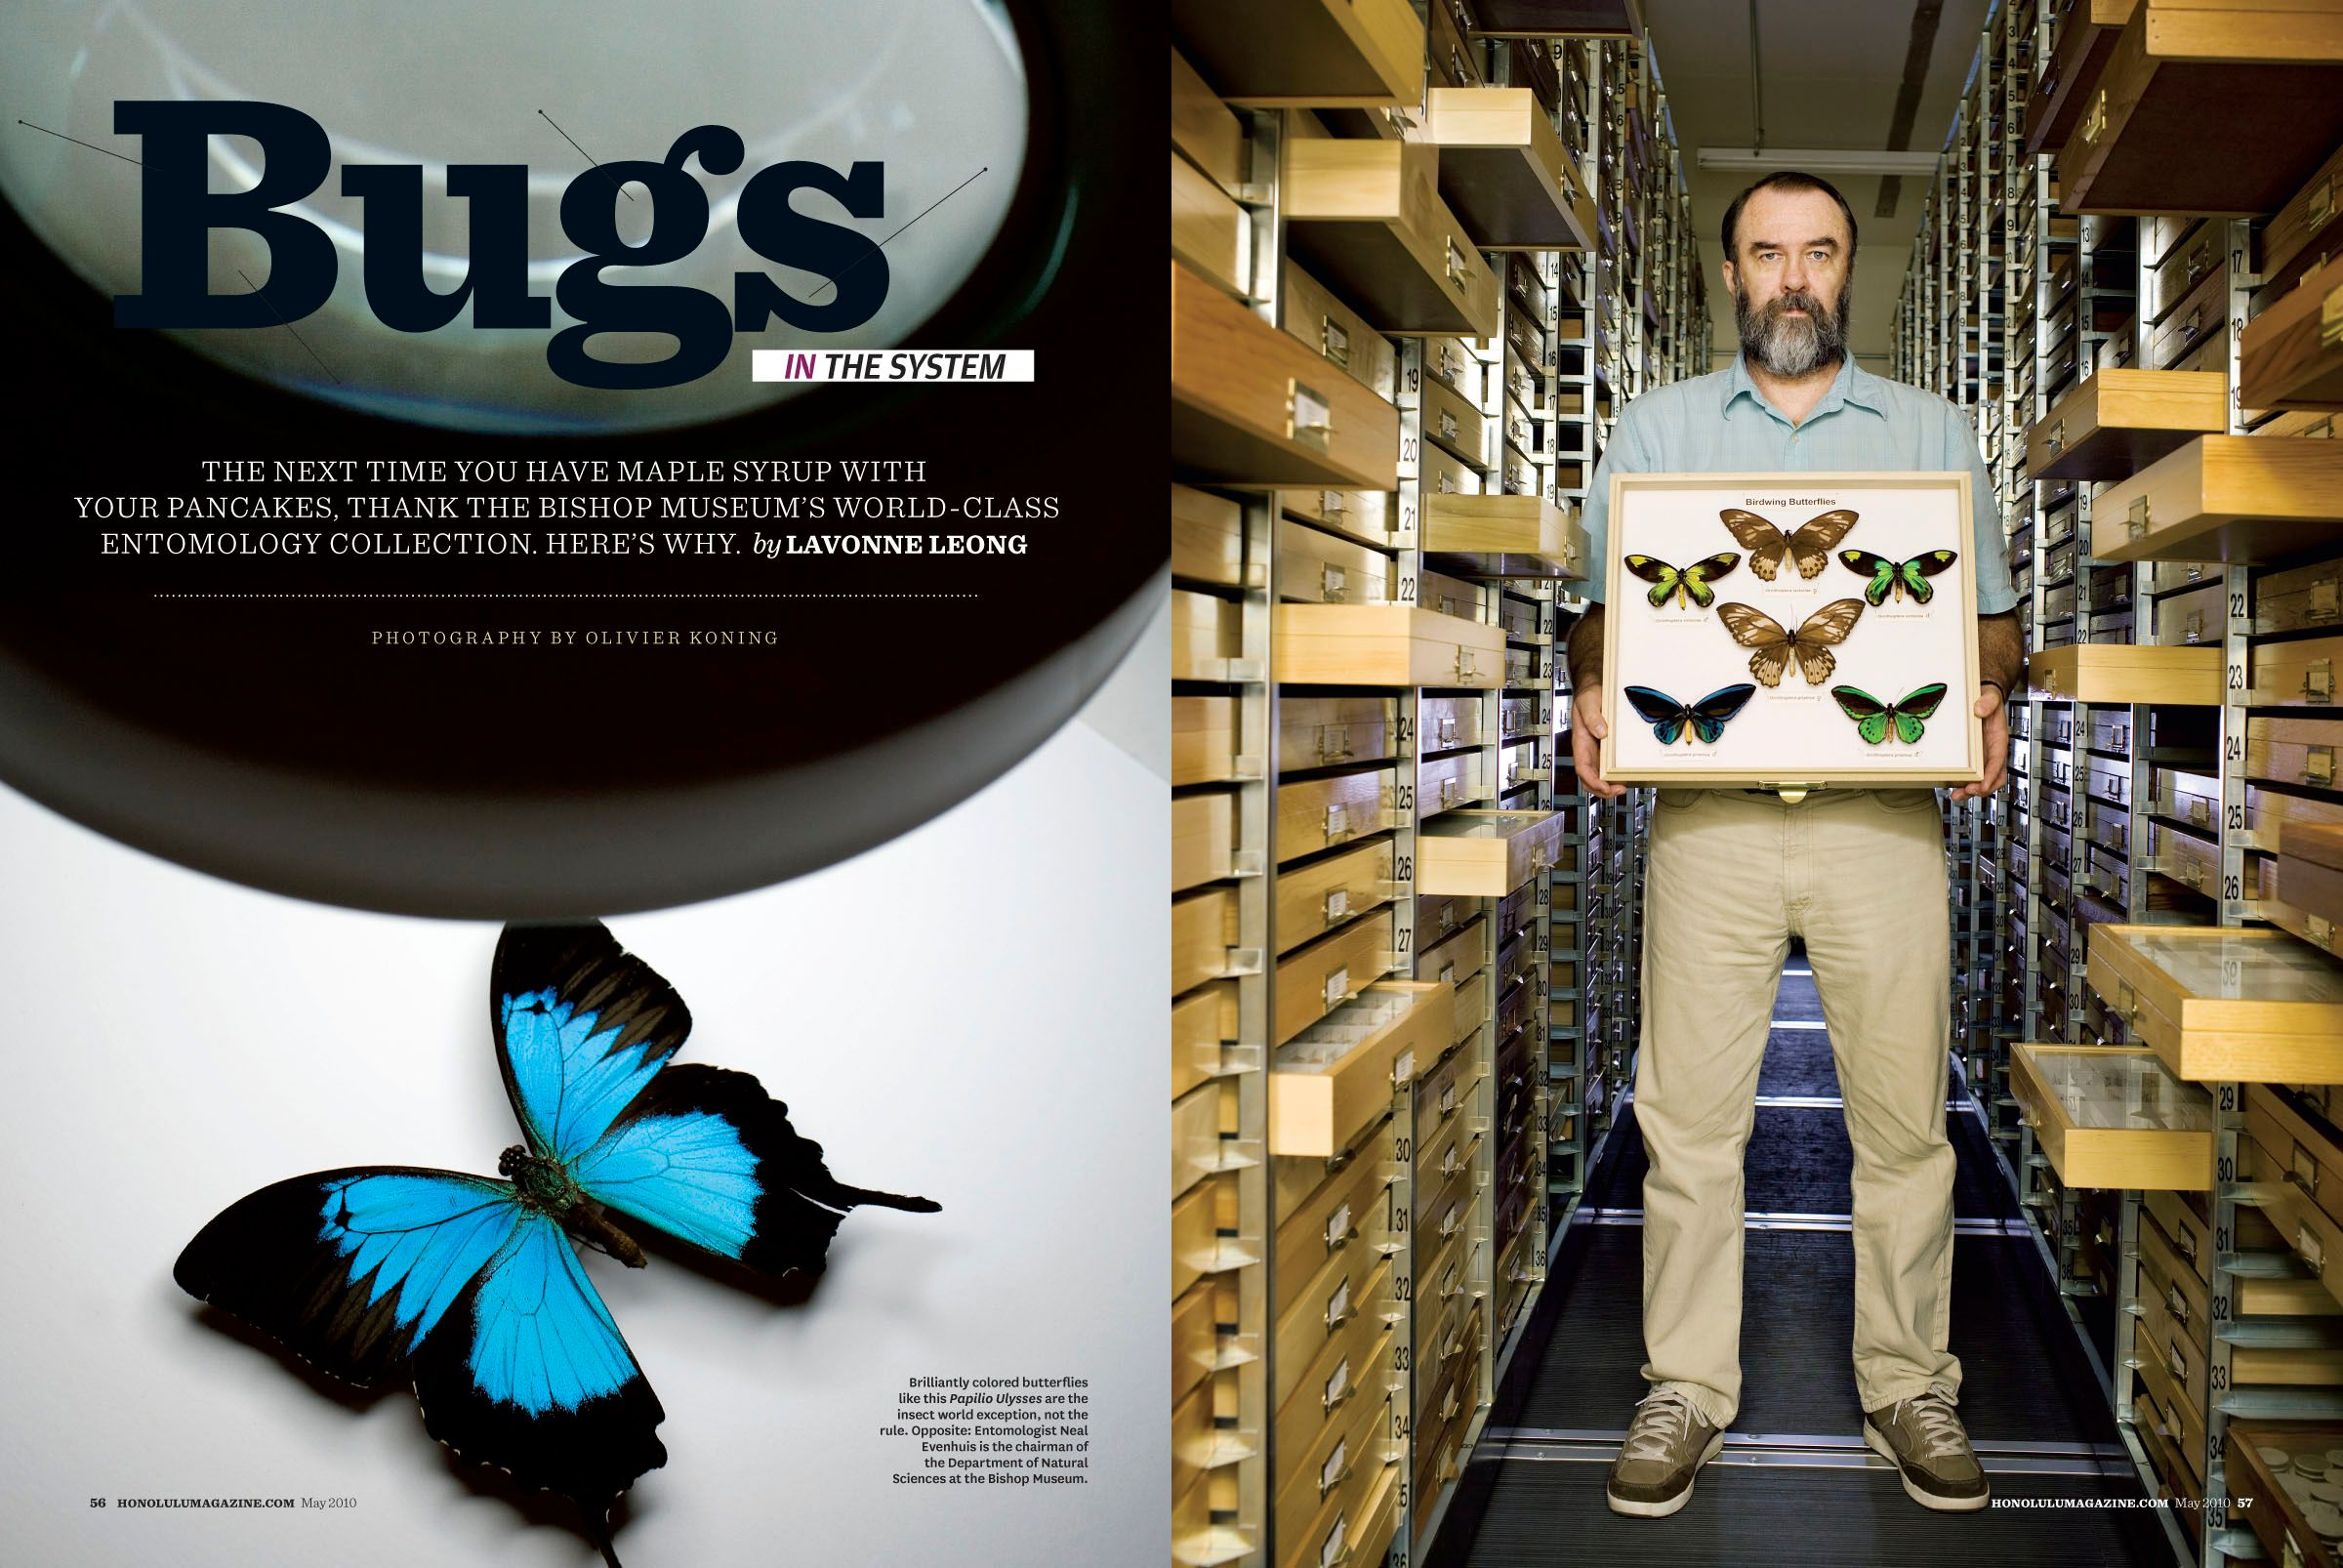 05-10_HM_Bugs-1.jpg